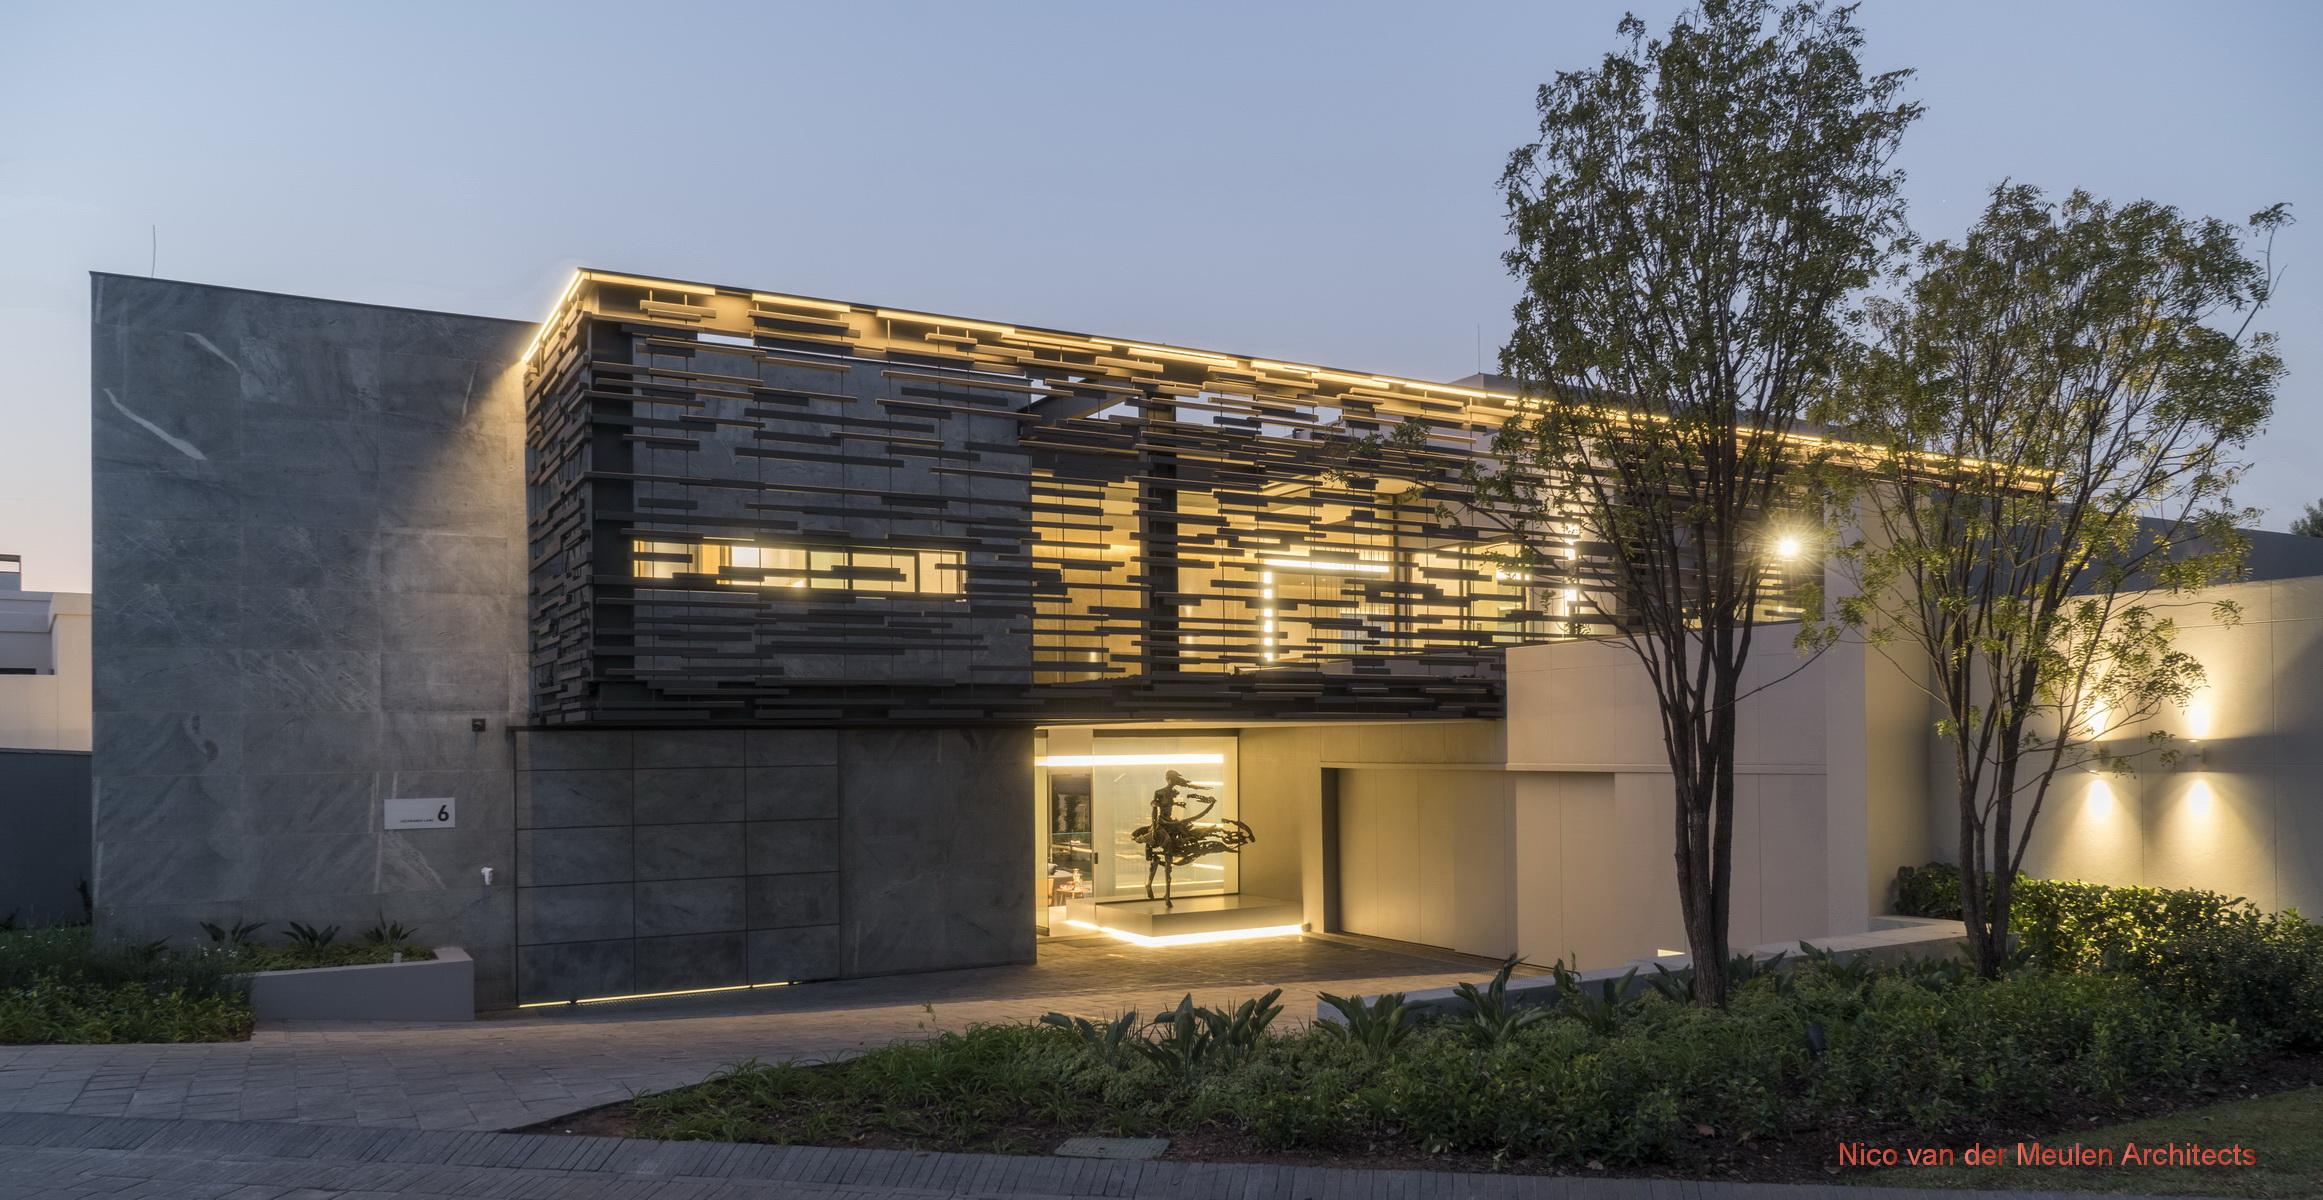 Forrest Road  Architect Magazine  Nico van der Meulen Architects Sandton Inanda SOUTH